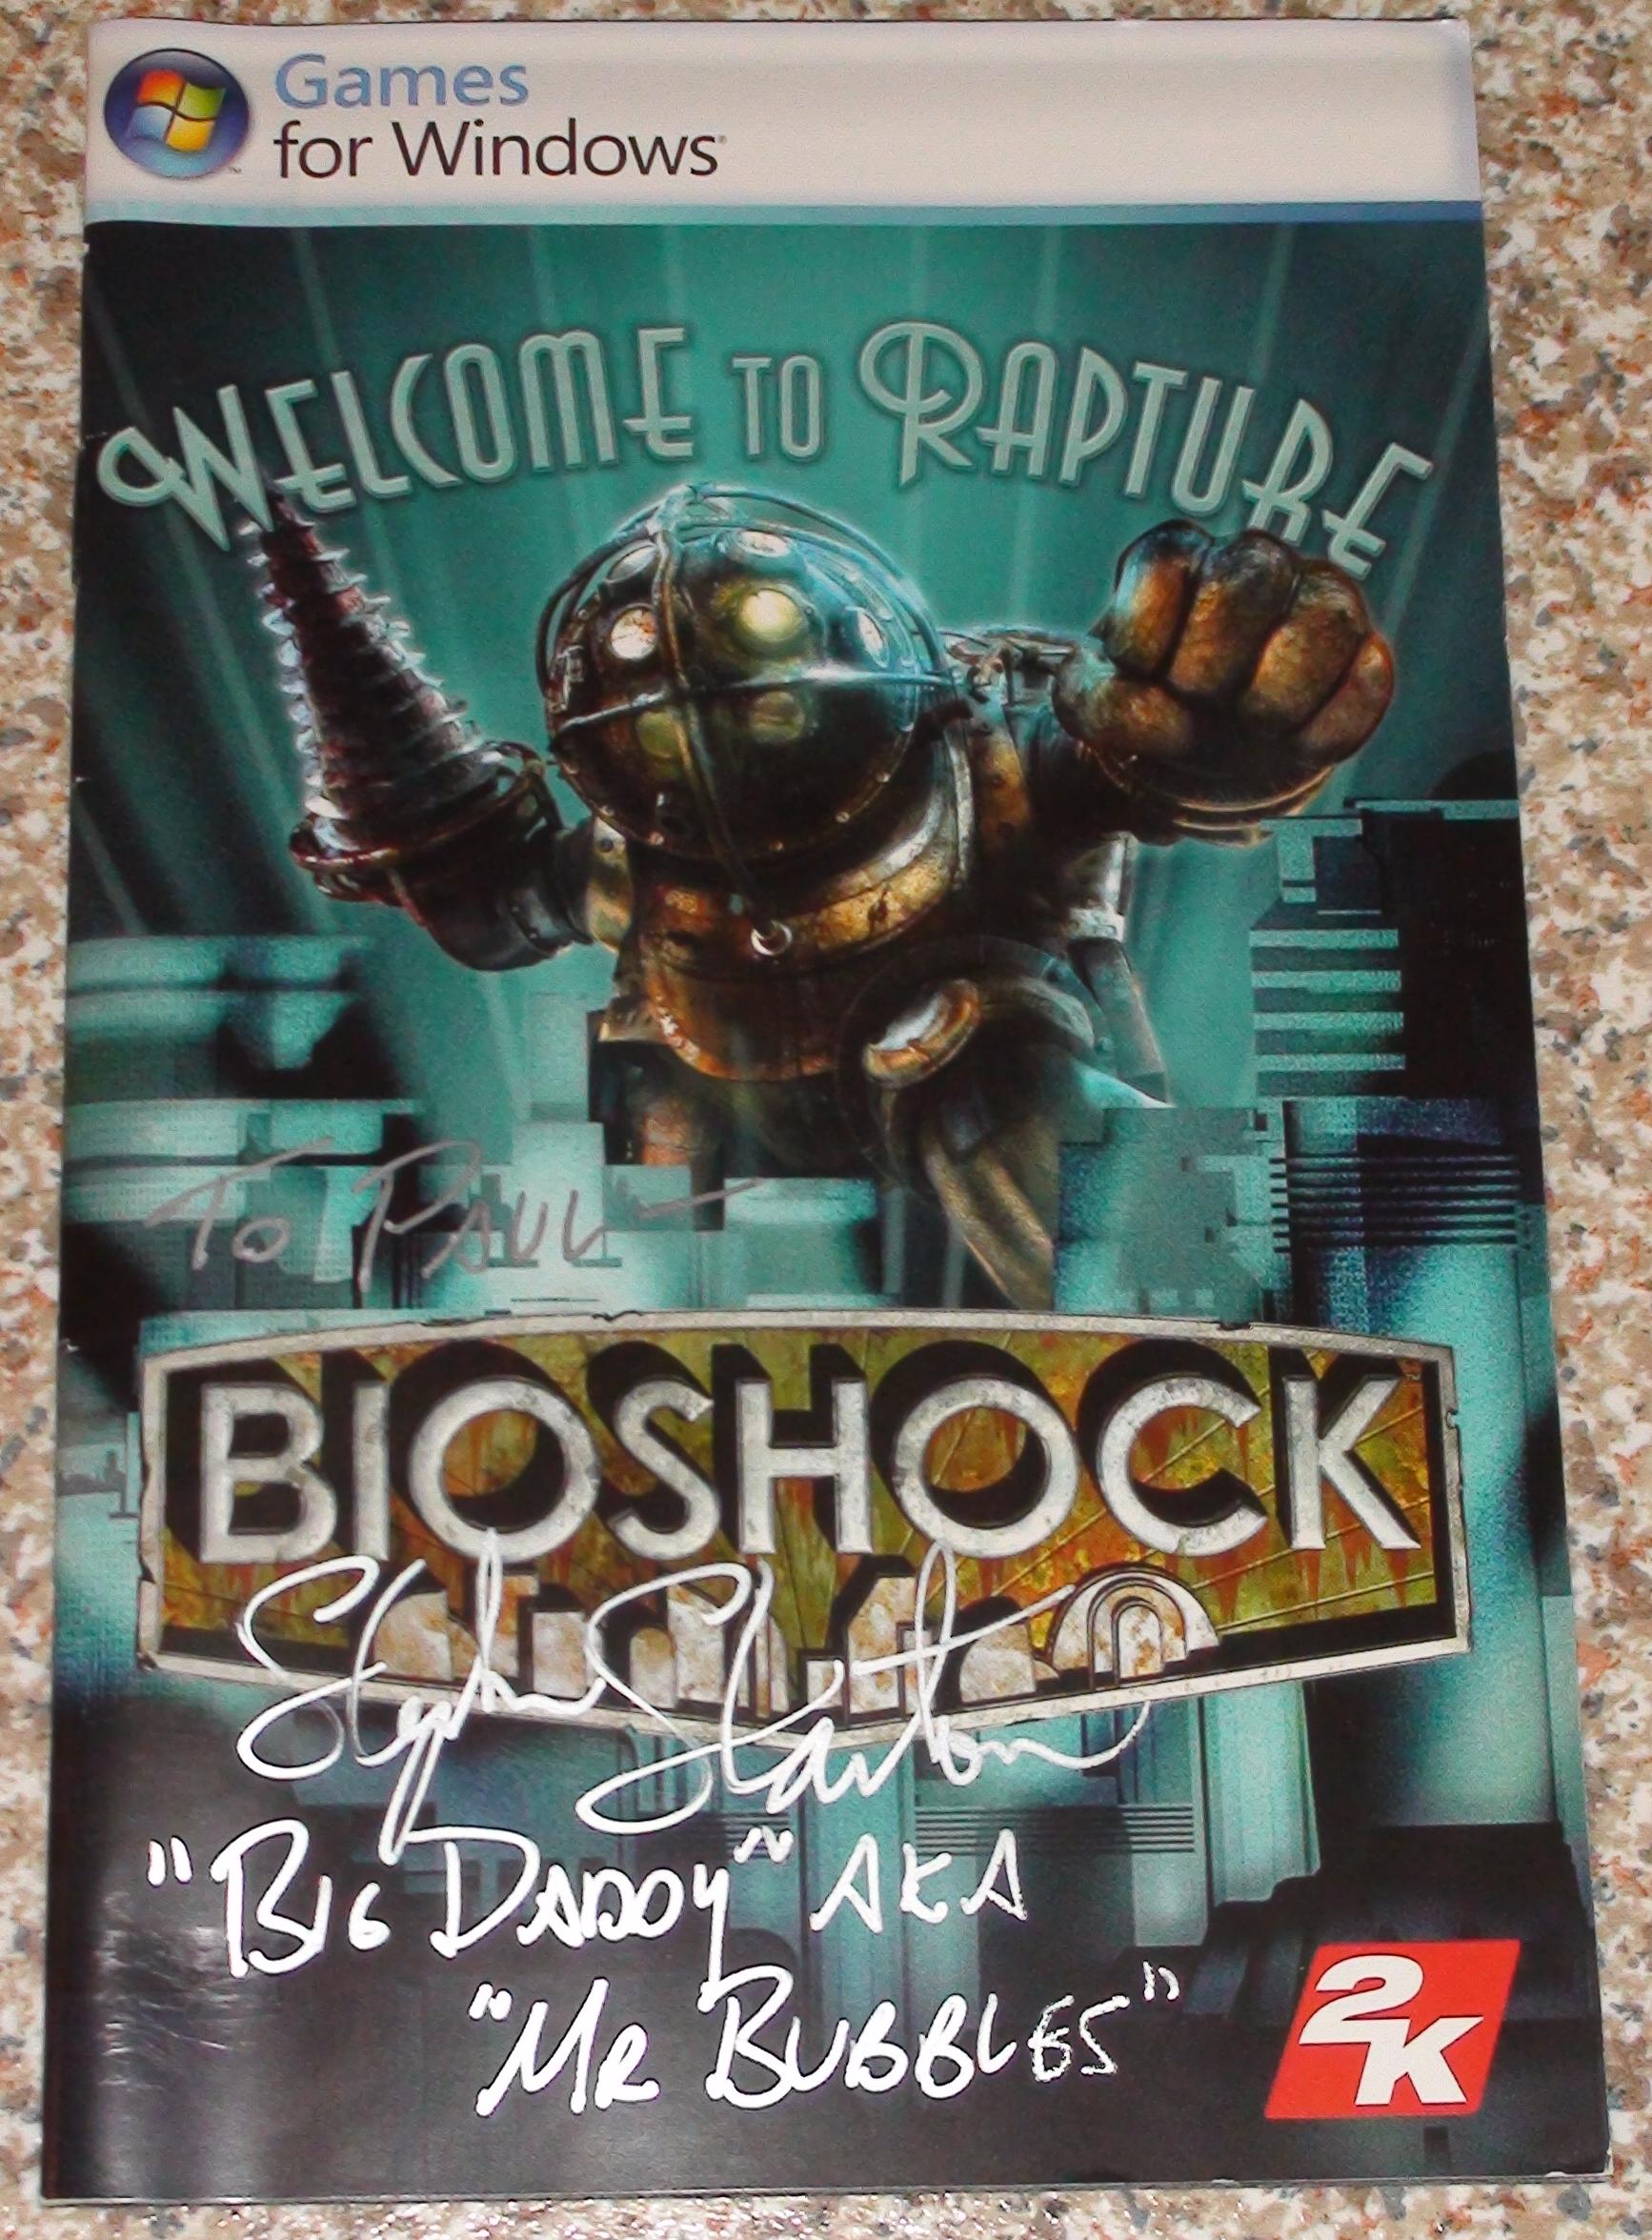 Bioshock - Stephen Stanton